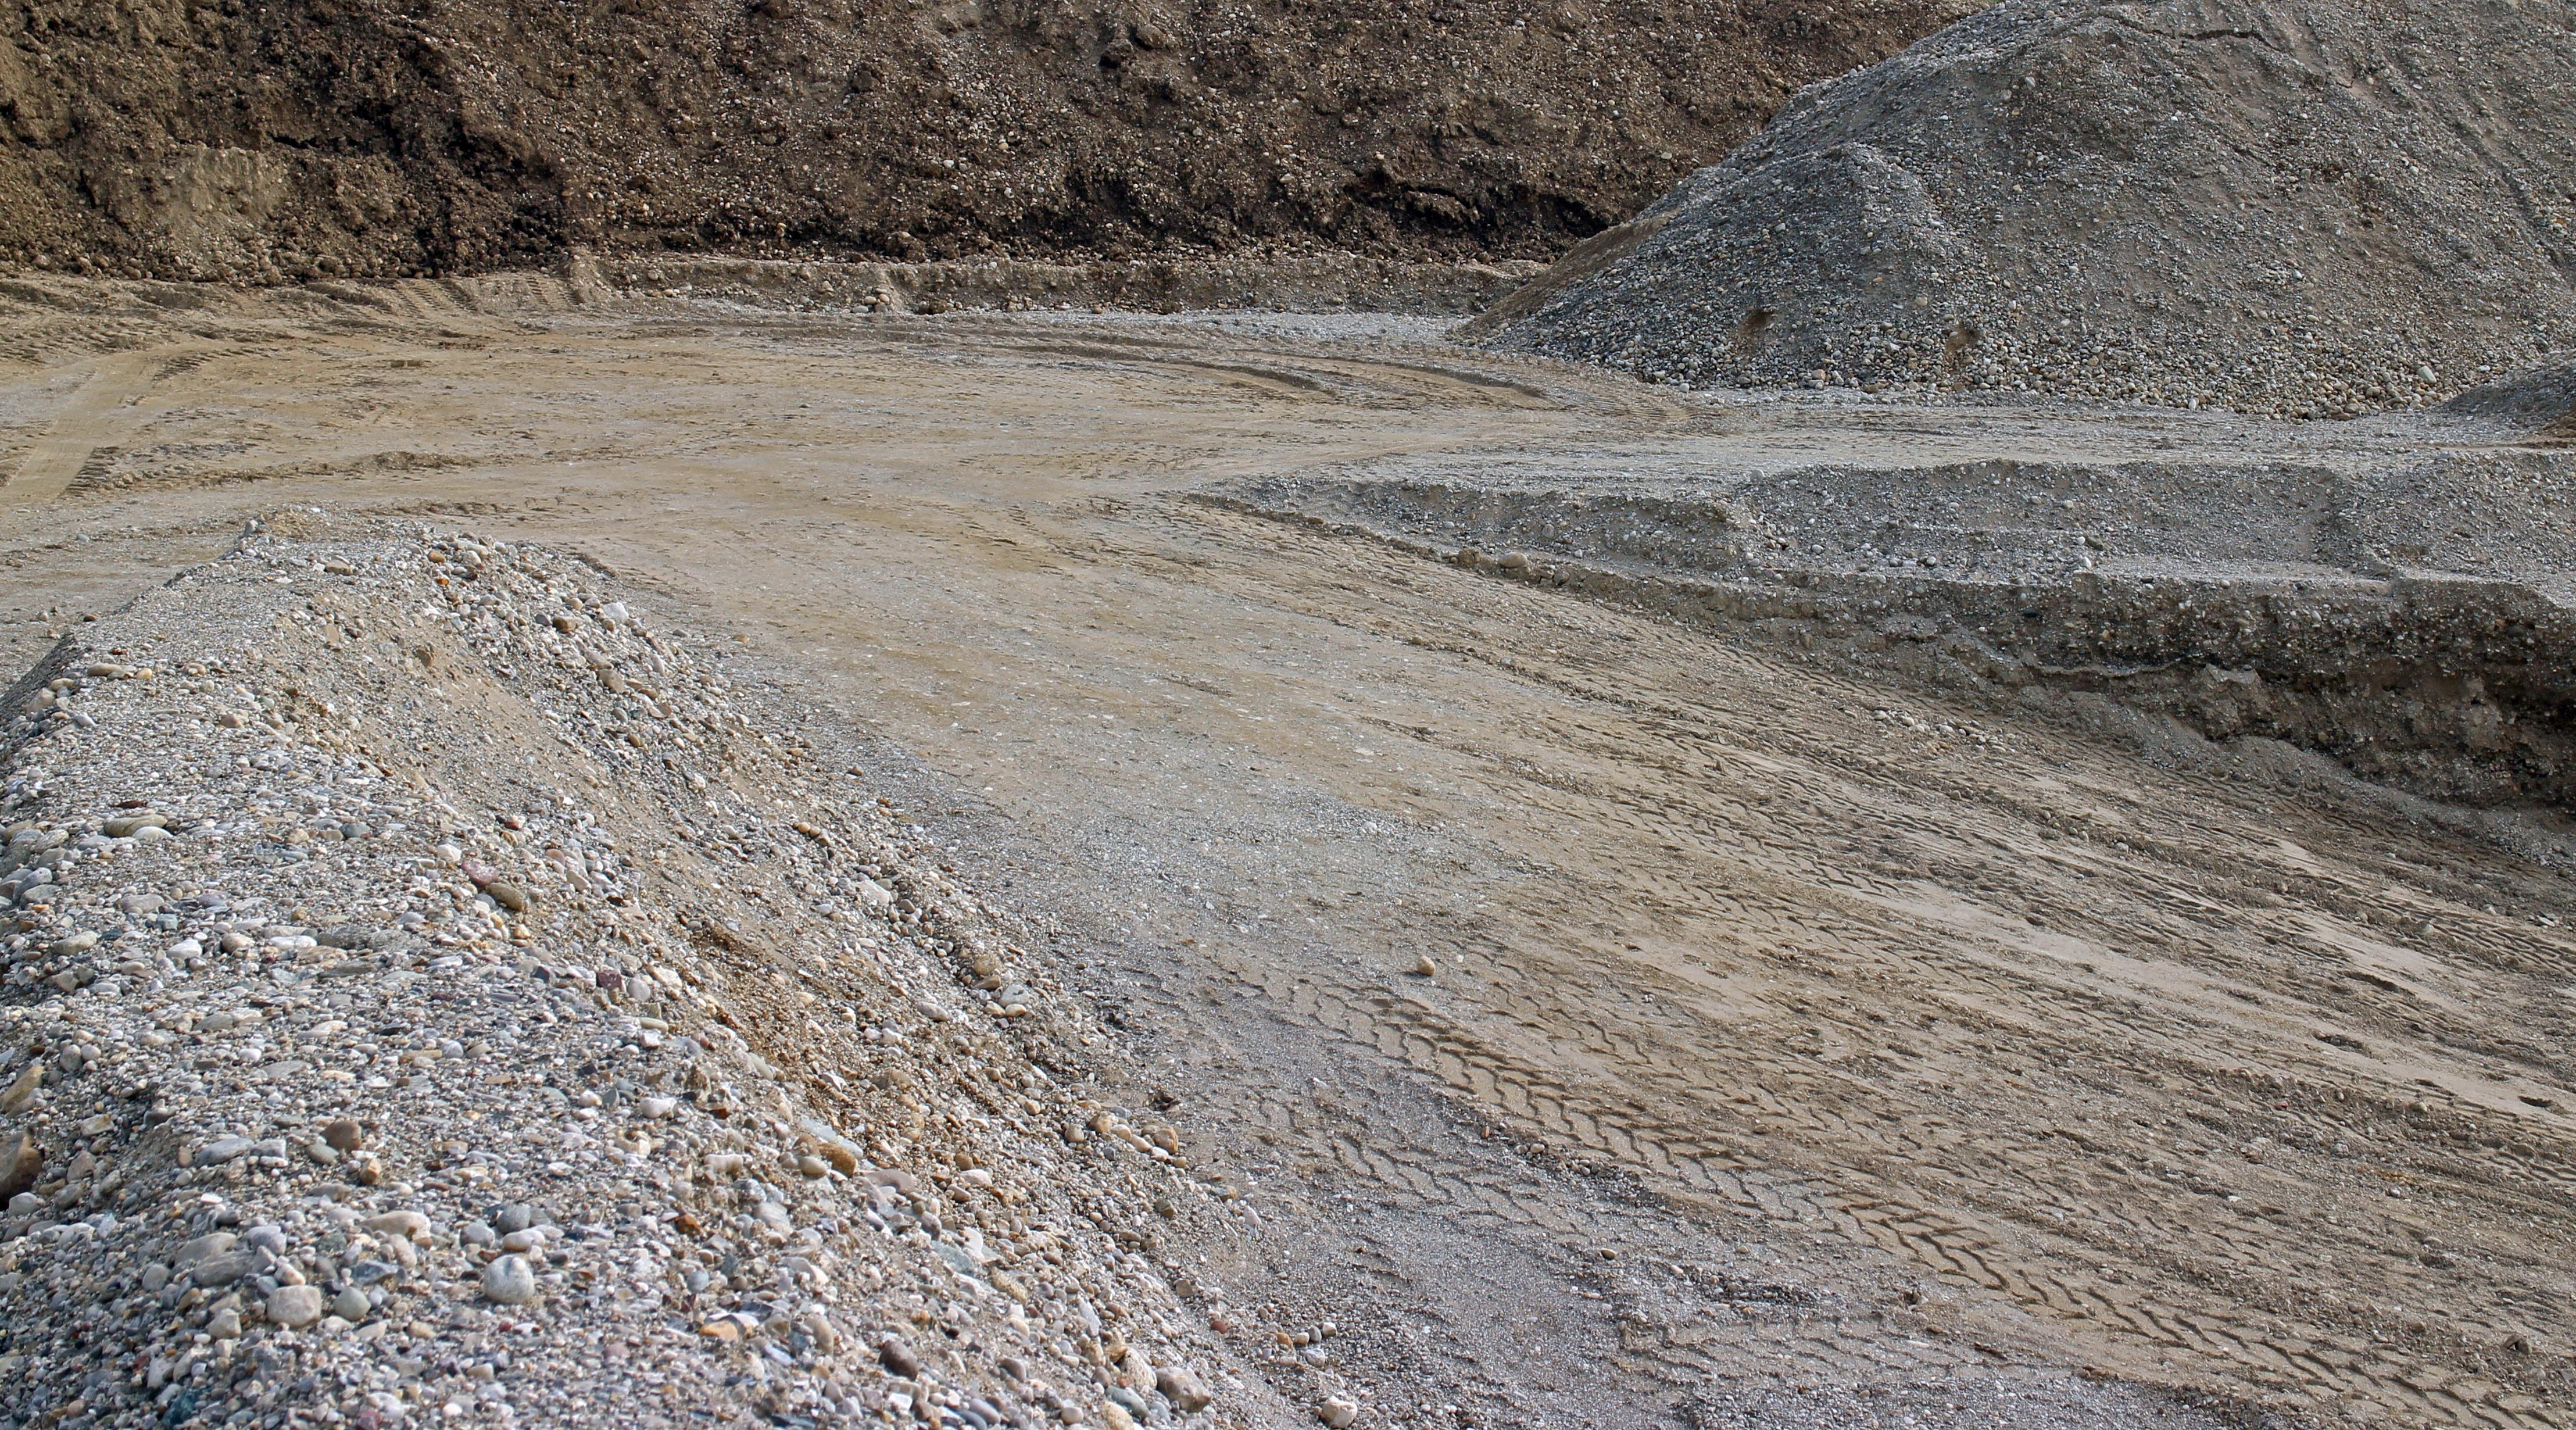 Free Images : sand, rock, valley, soil, ridge, grey, stones